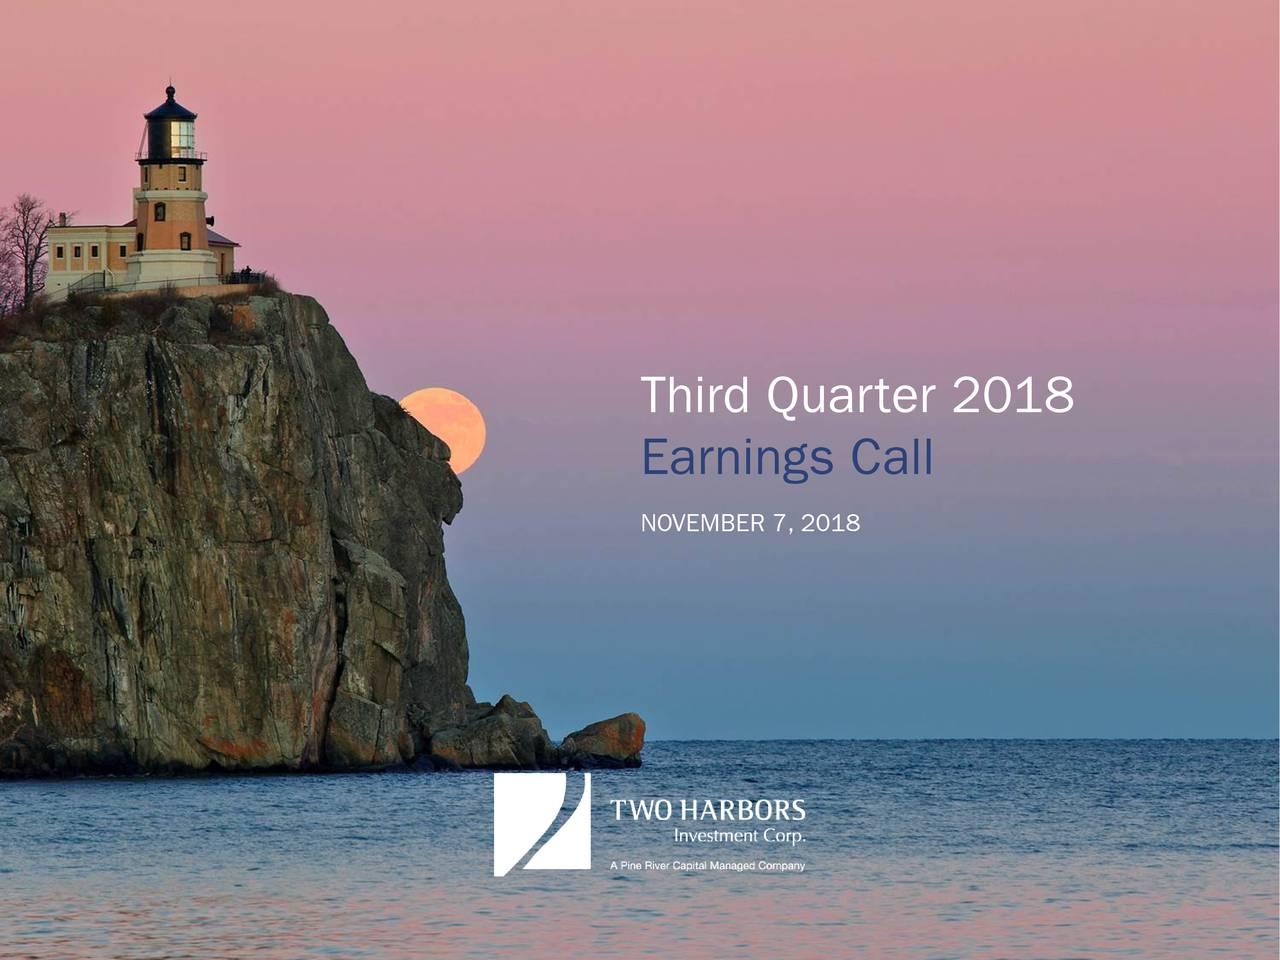 Earnings Call NOVEMBER 7, 2018